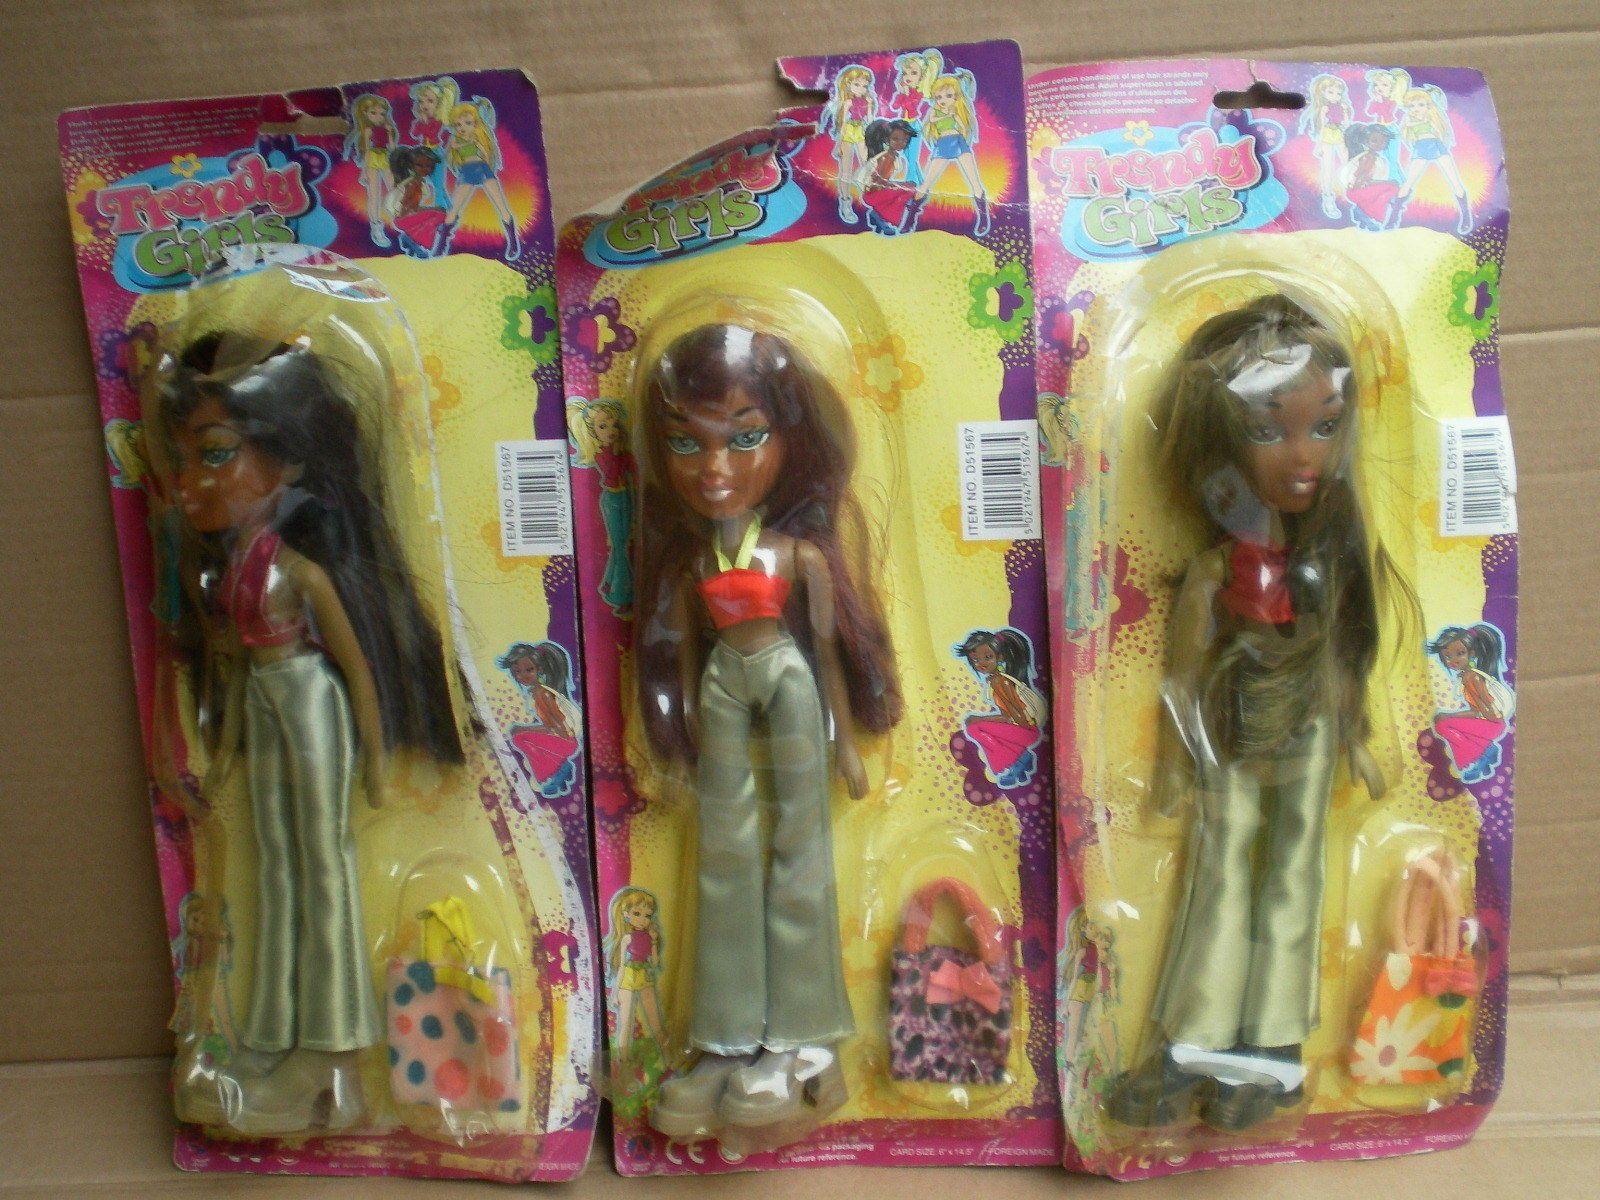 Light Plastic Bratz Clone Fashion 10 Doll Bundle Job Lot Damaged From 90s Ebay Dolls Vintage Dolls 10 Things